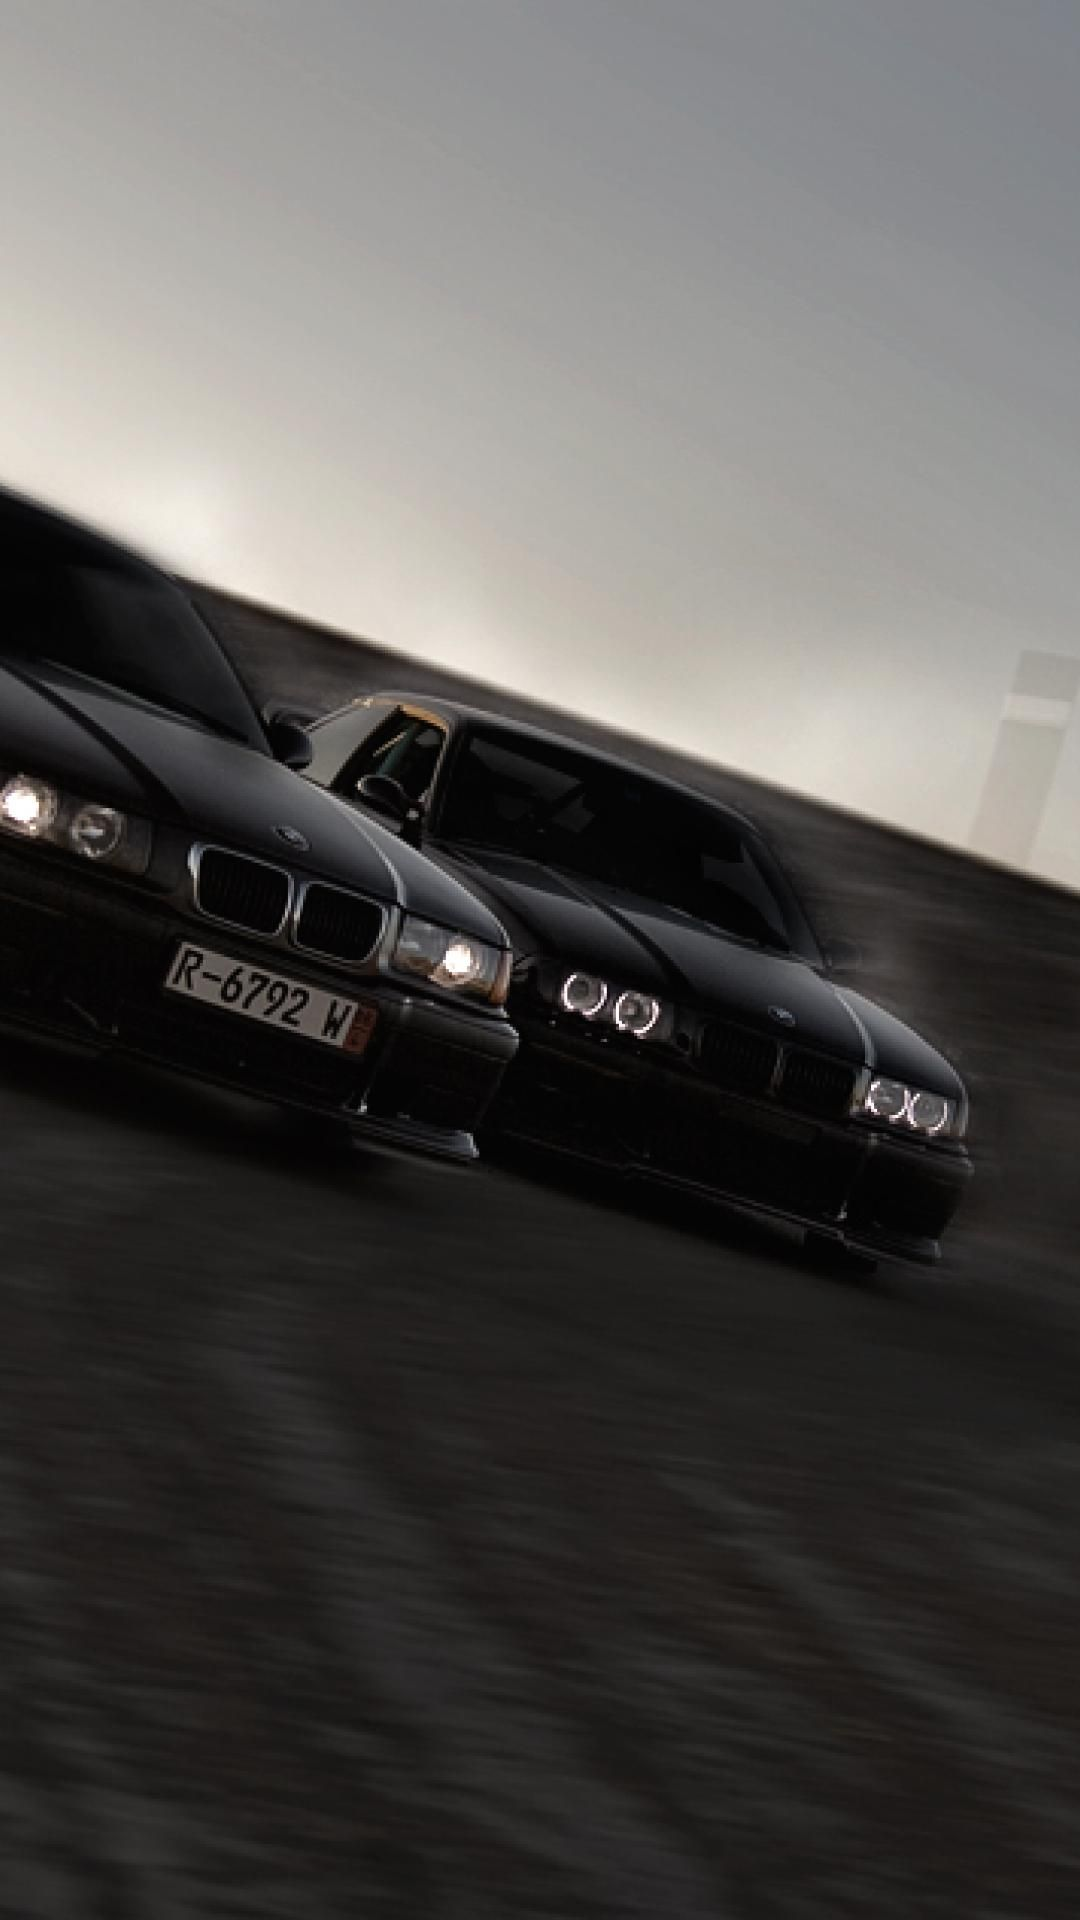 bmw m3 e36 drift auto & moto bmw iphone 6 plus wallpaper | bmw e36